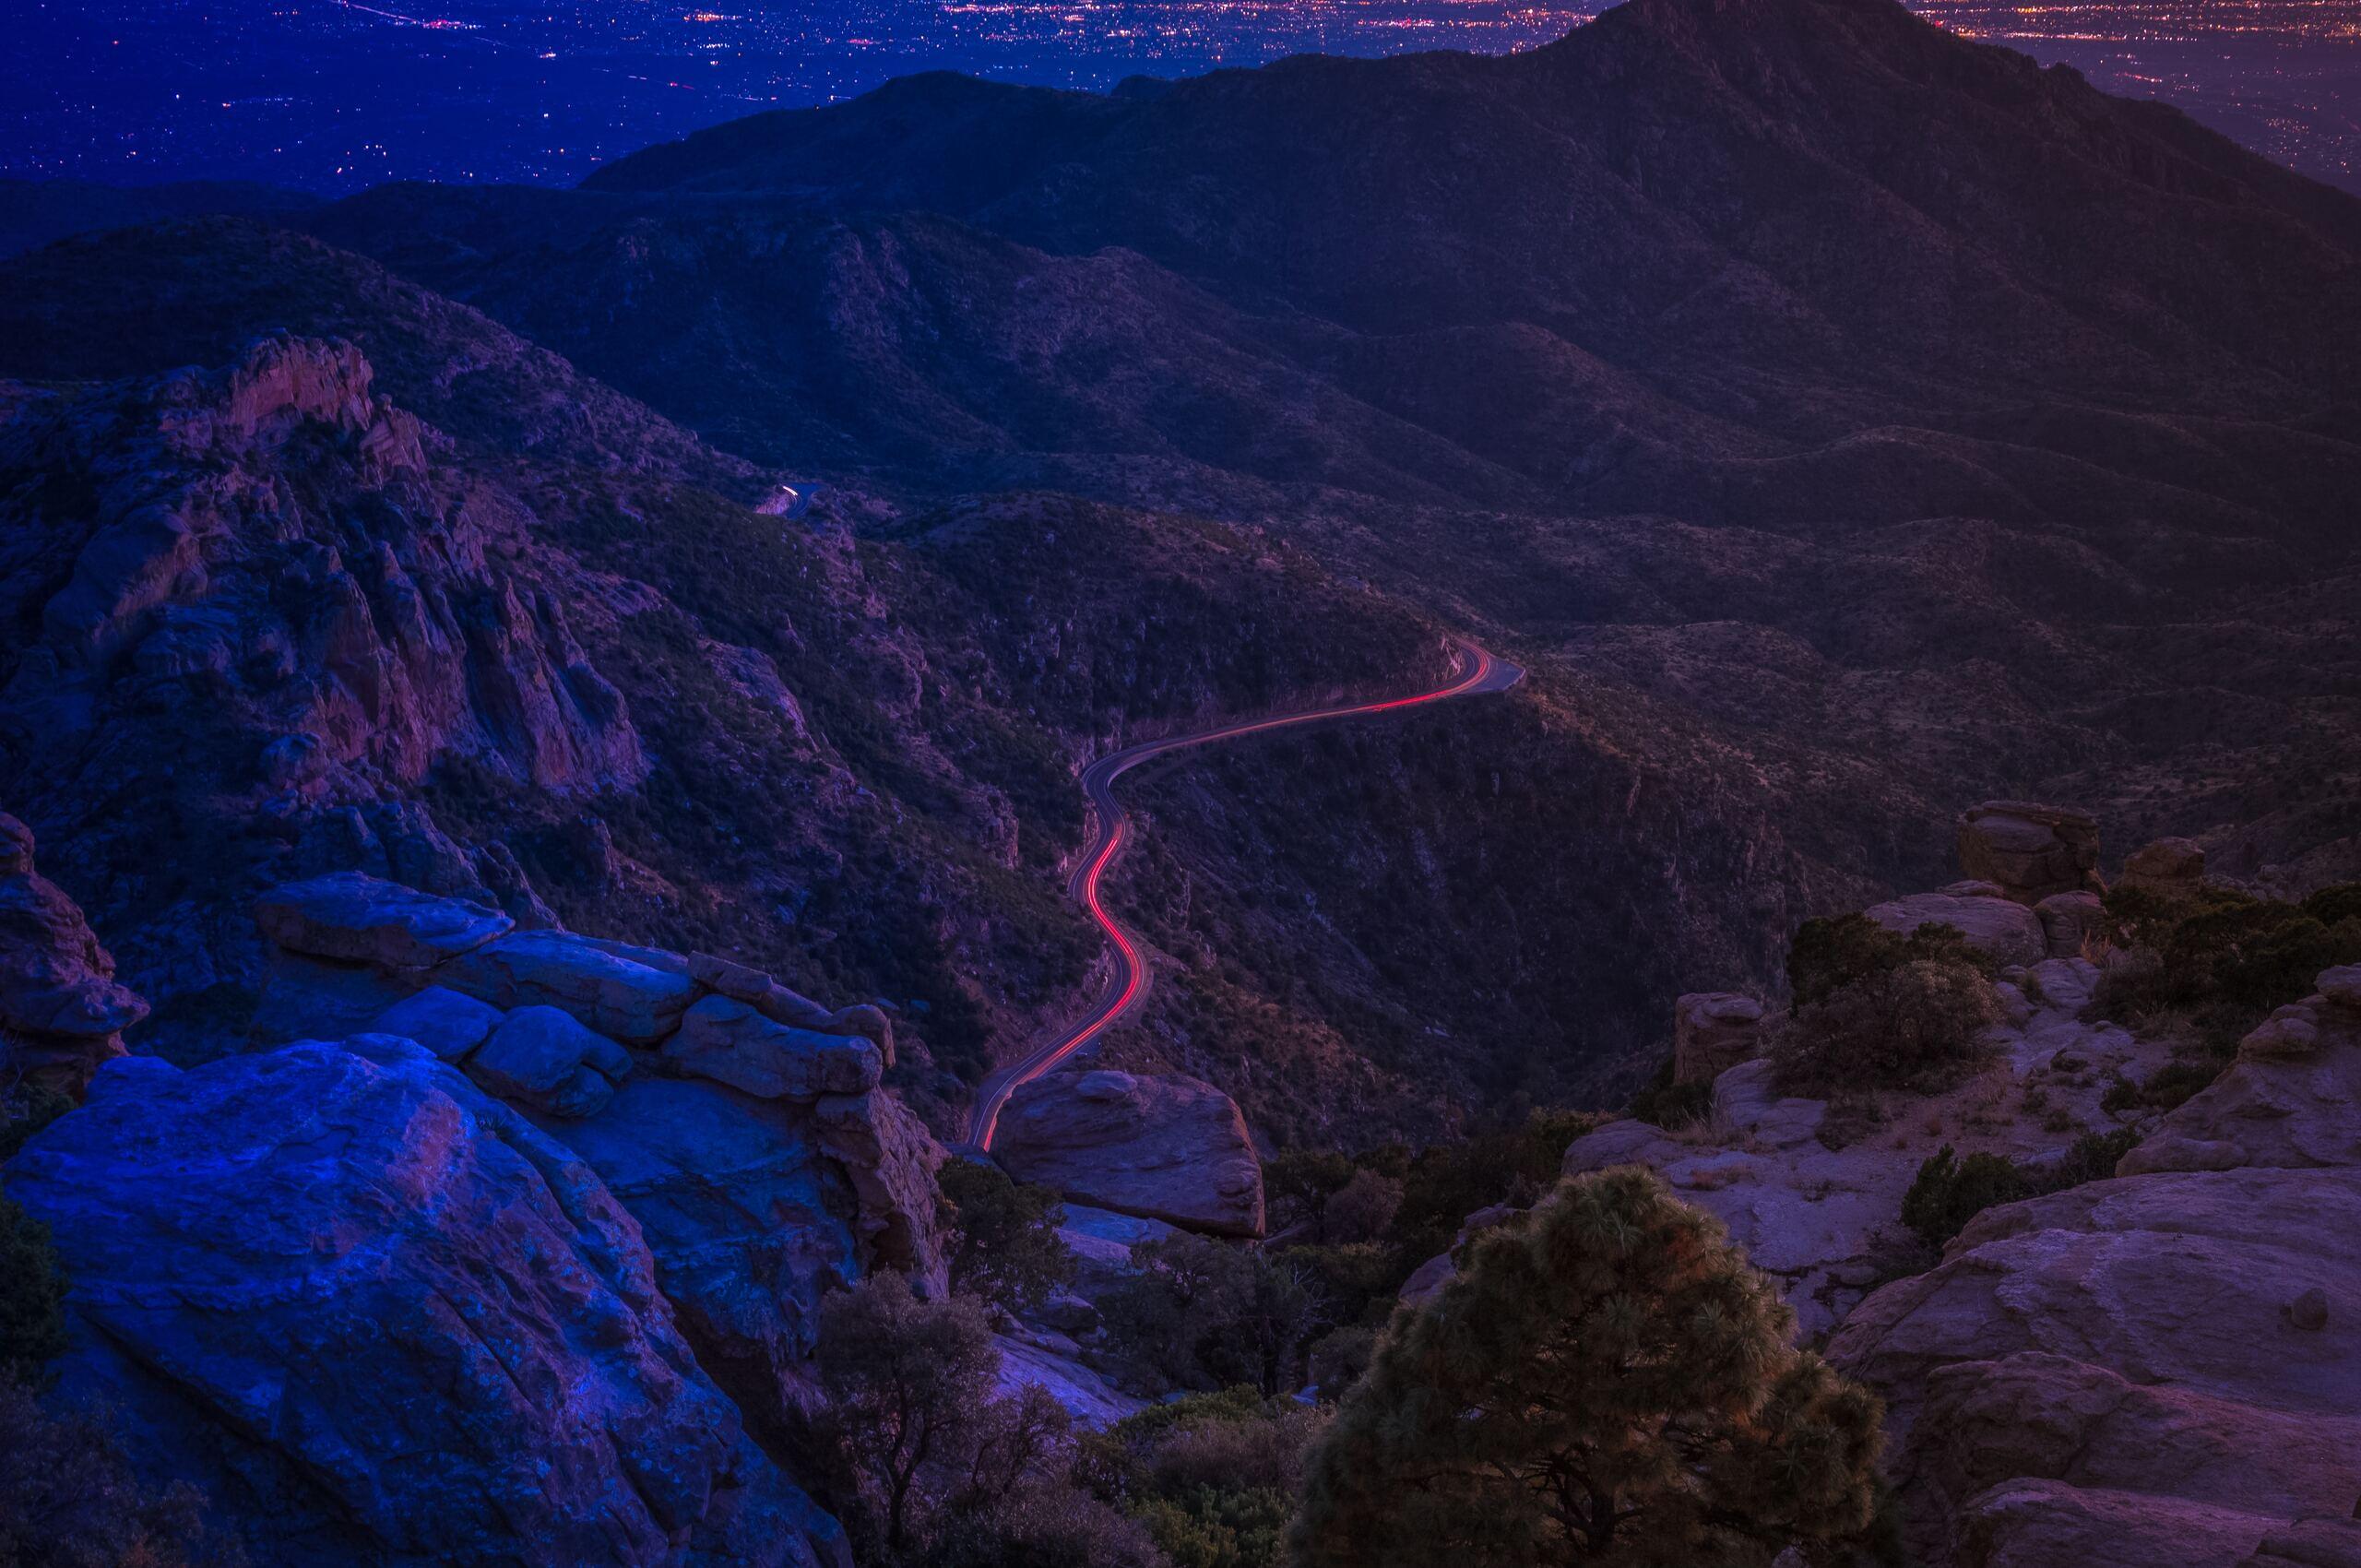 trail-road-long-exposure-4k-d4.jpg